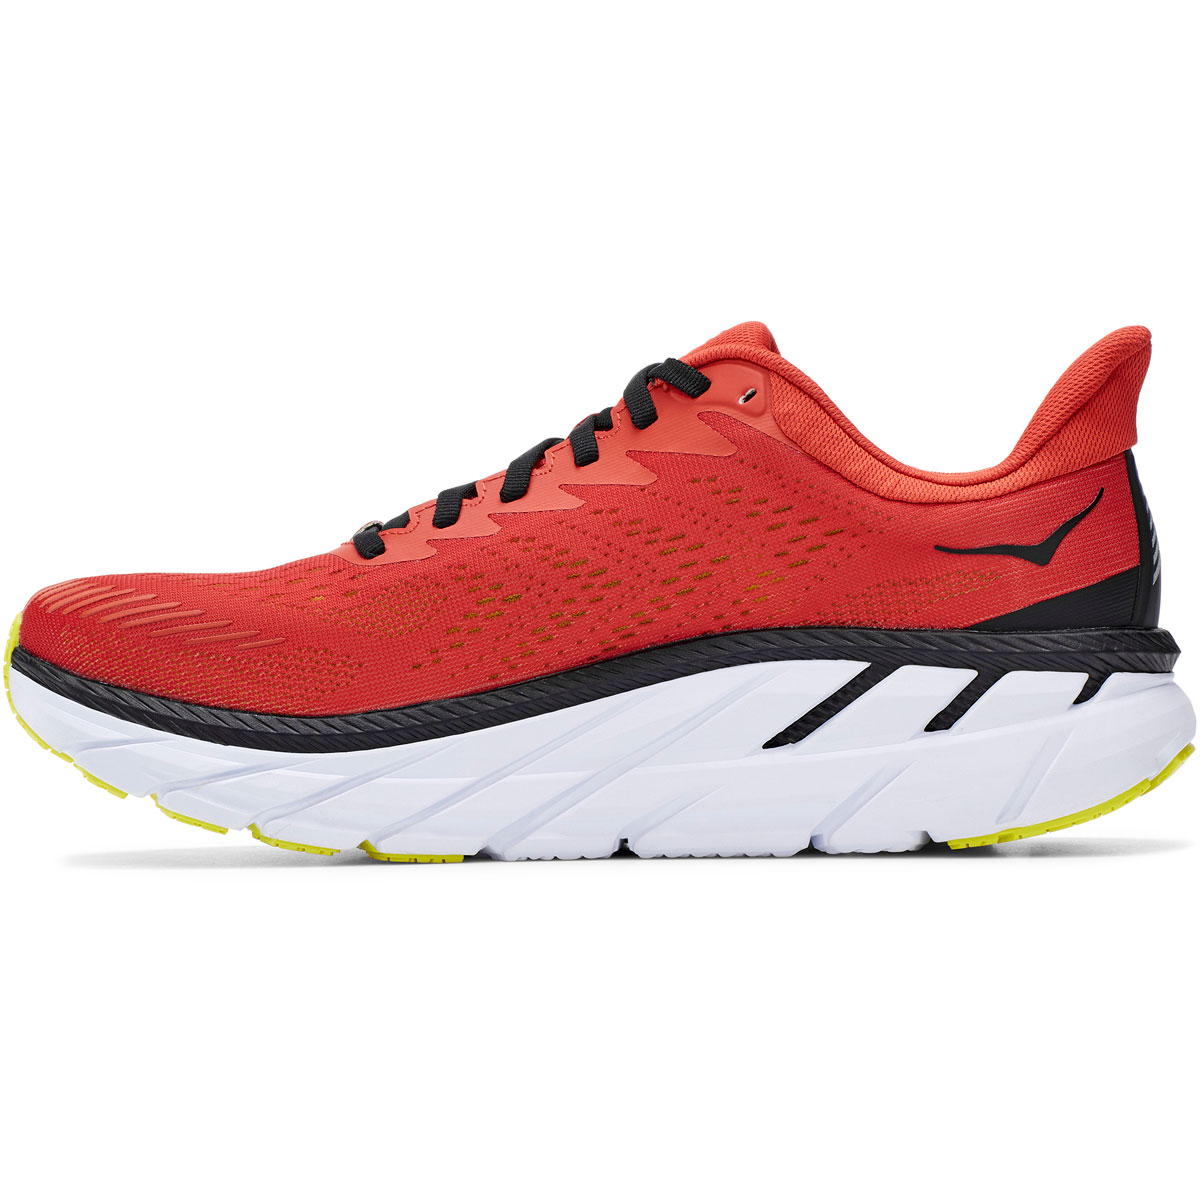 Men's Hoka One One Clifton 7 Running Shoe - Color: Chili/Black - Size: 9 - Width: Regular, Chili/Black, large, image 6